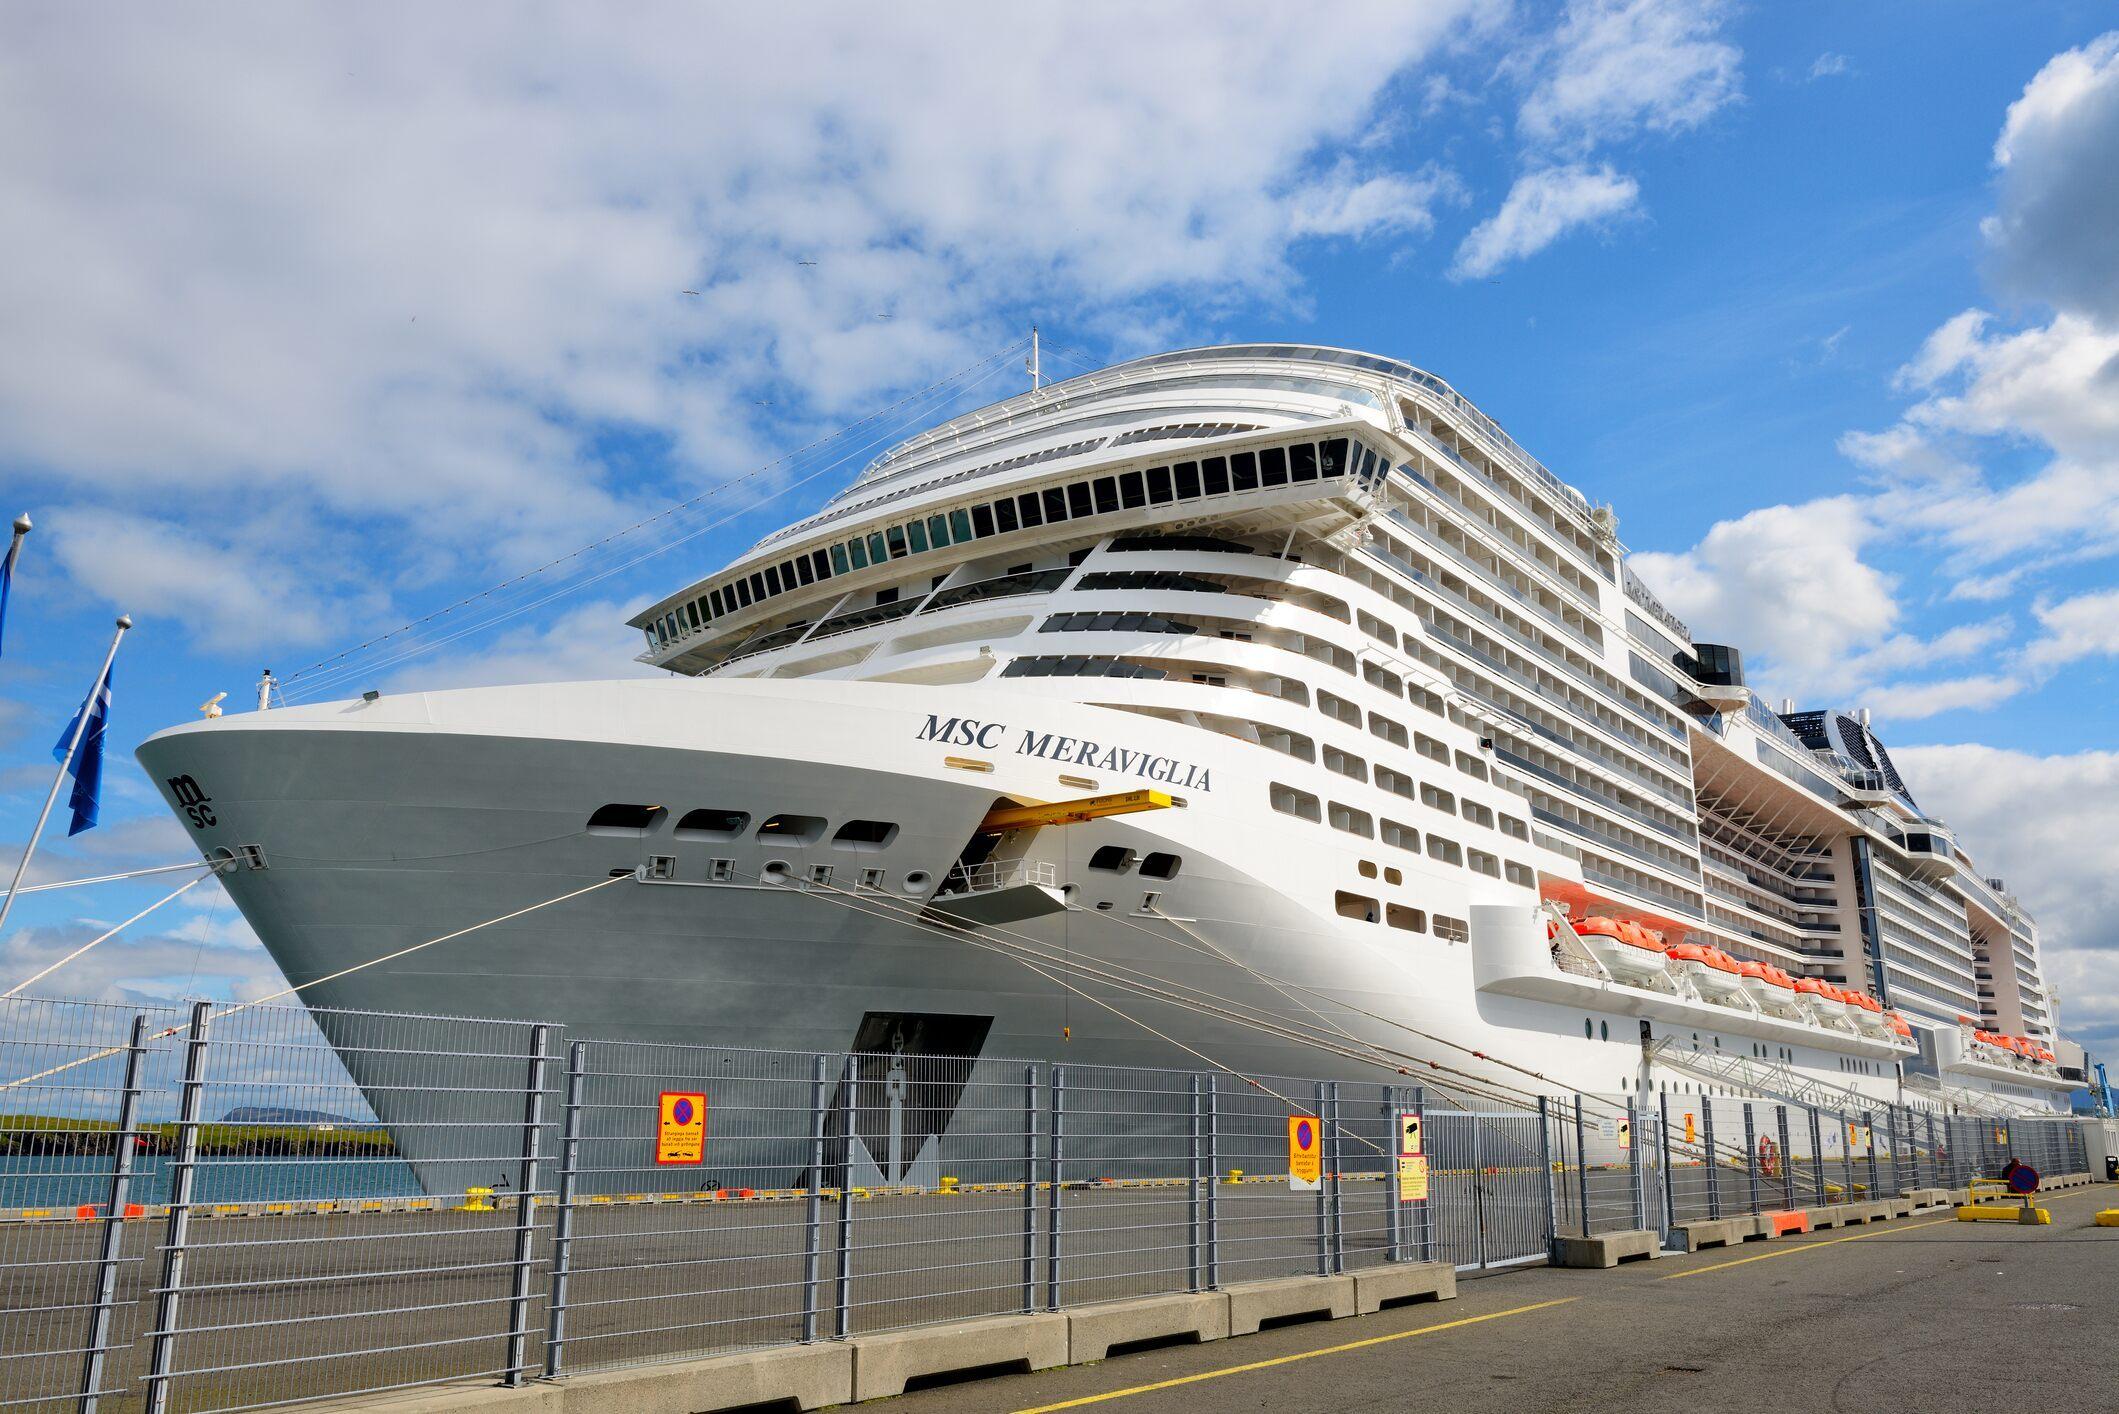 MSC Meraviglia denied entry to port over Coronavirus fears | Cruise.Blog